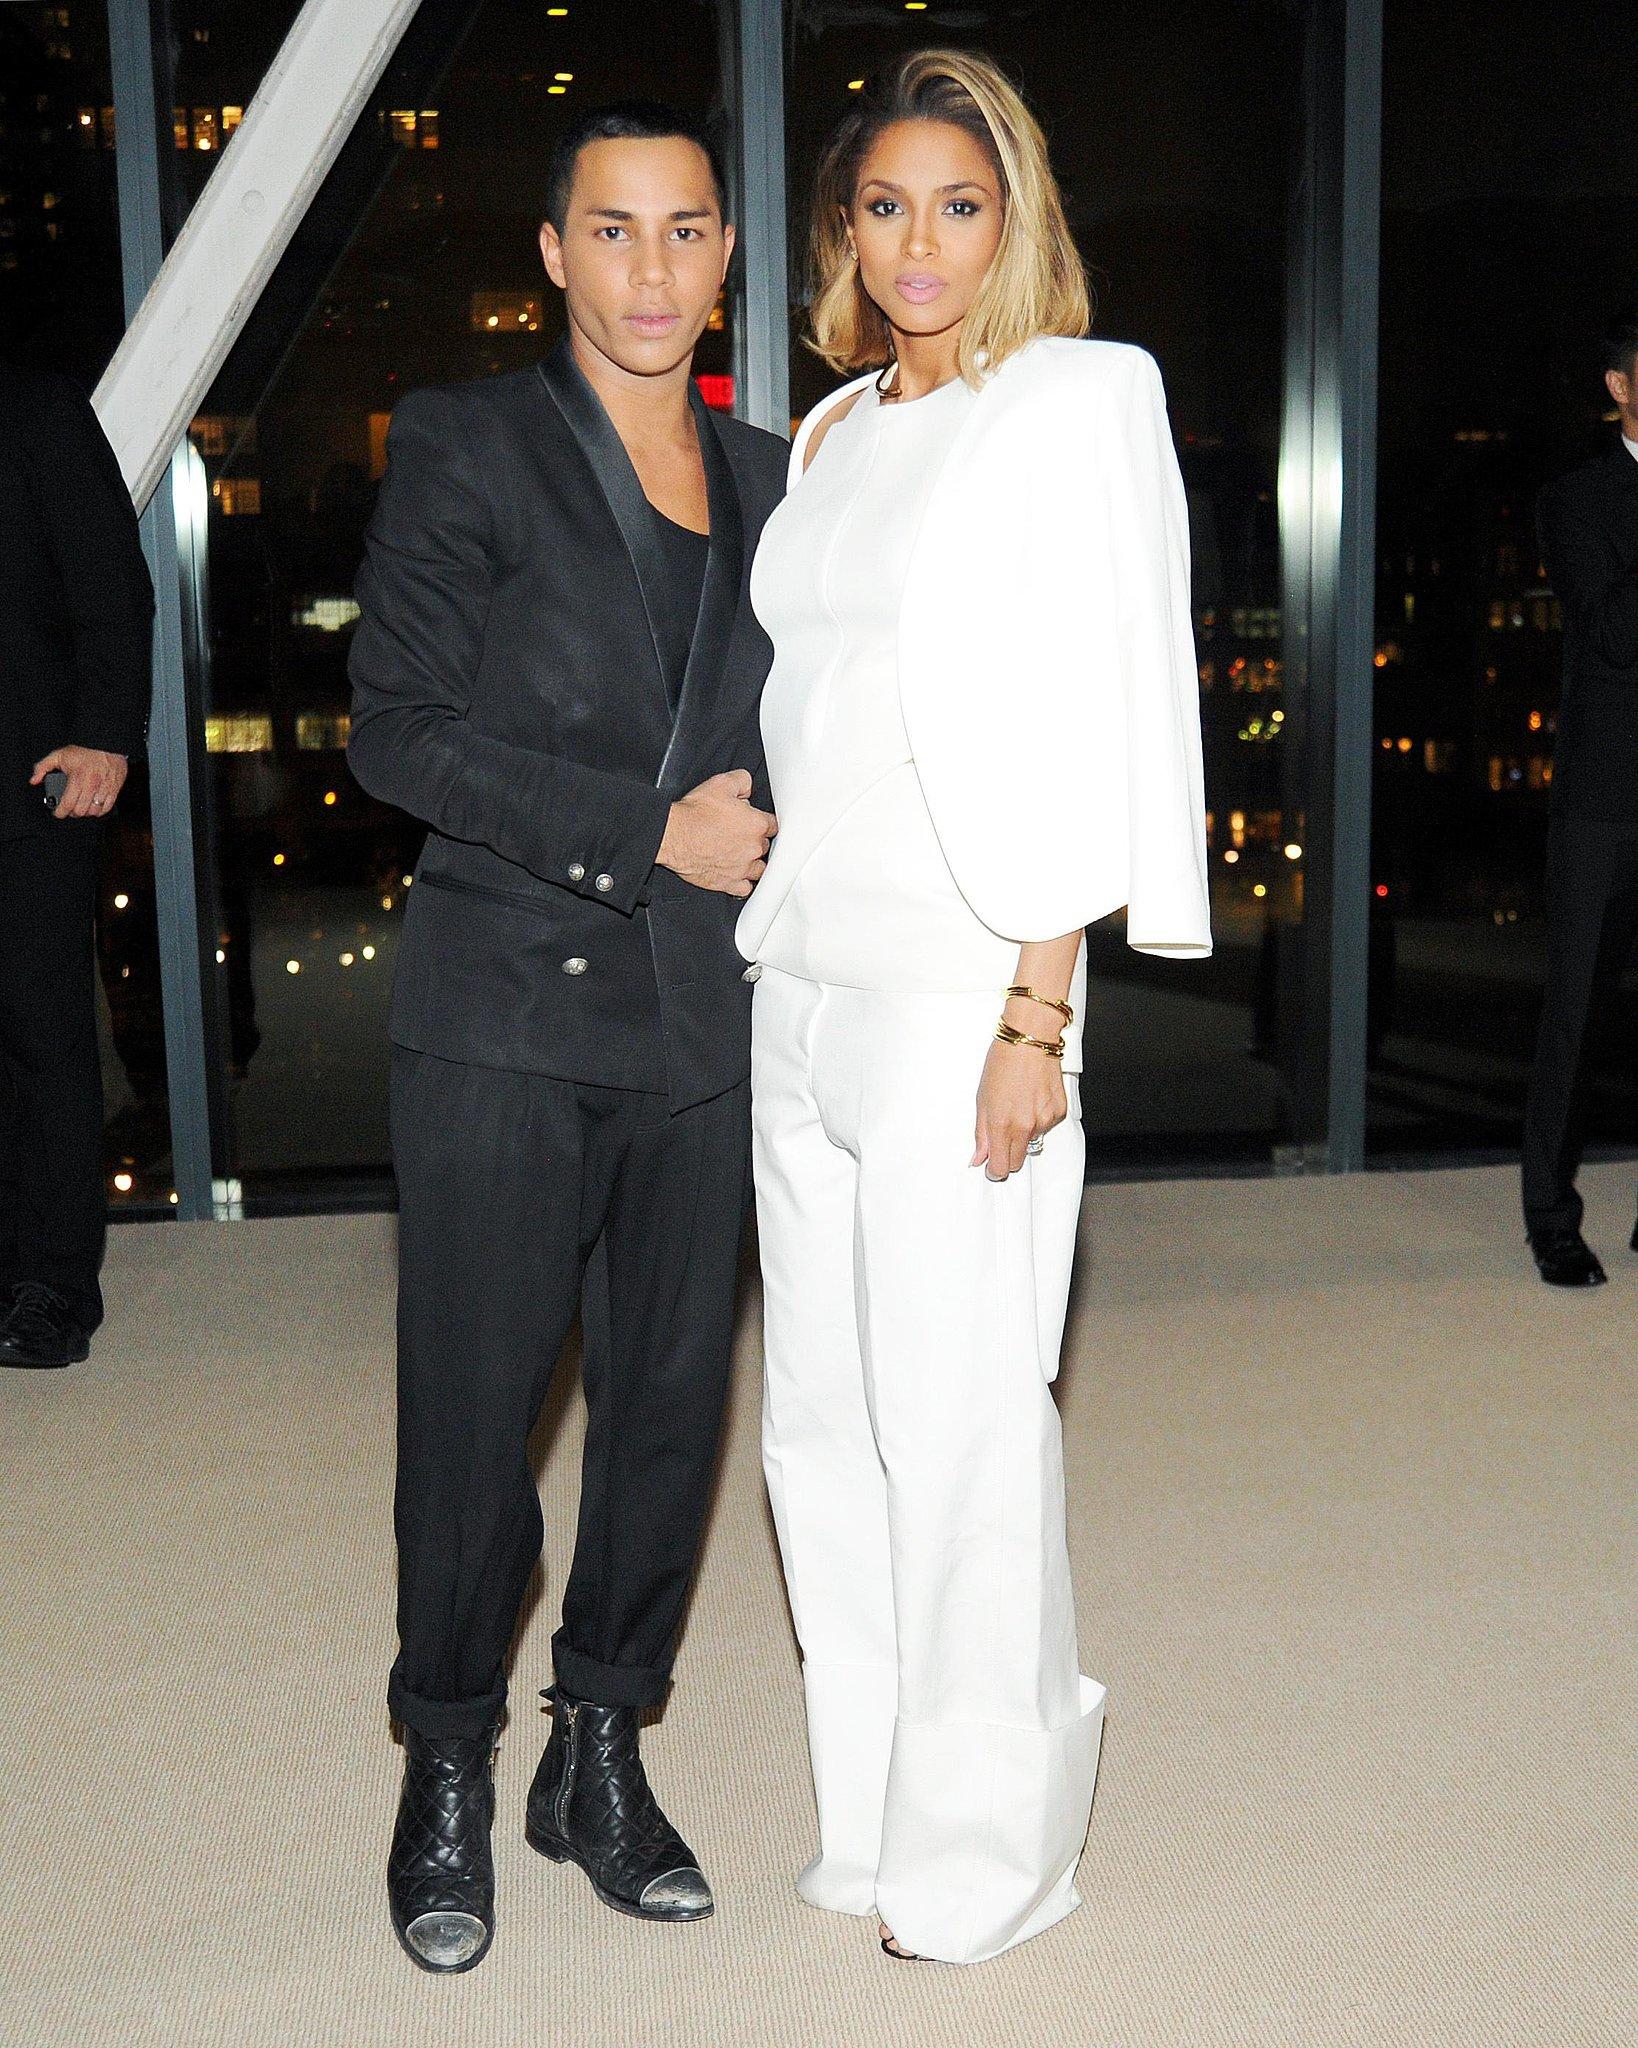 Balmain designer Olivier Rousteing and Ciara